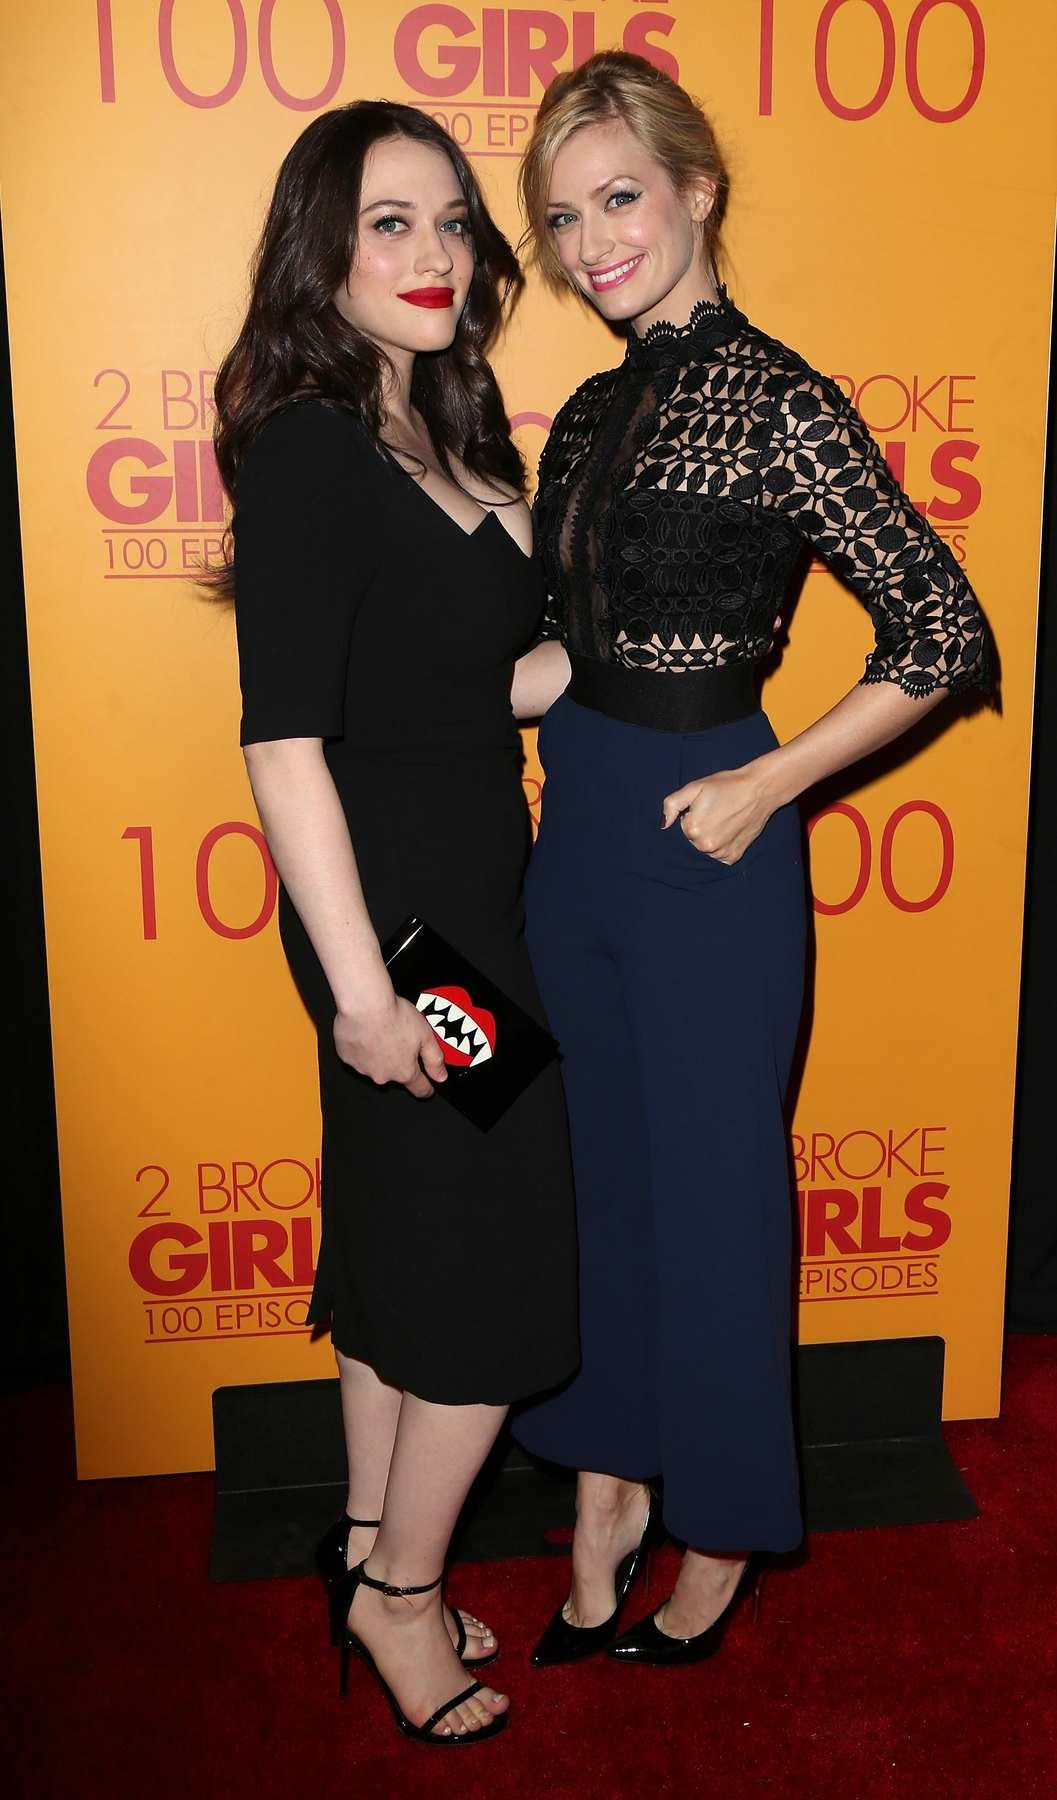 Kat Dennings and Beth Behrs at episode celebration of CBS Broke Girls